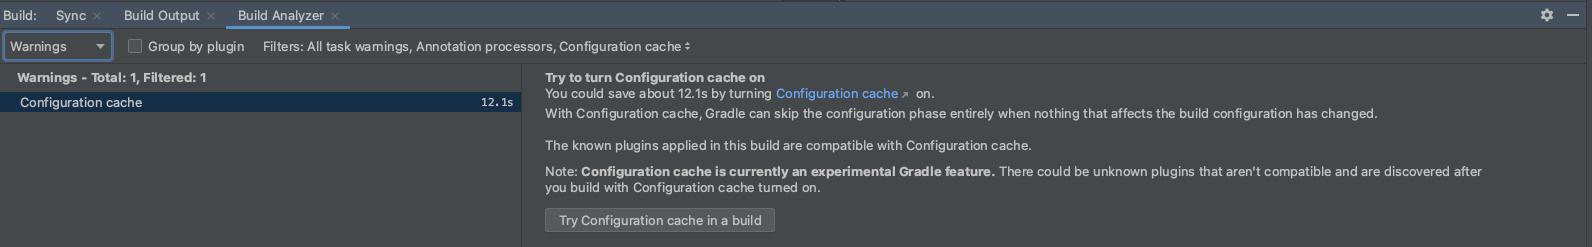 Informasi cache konfigurasi di Build Analyzer